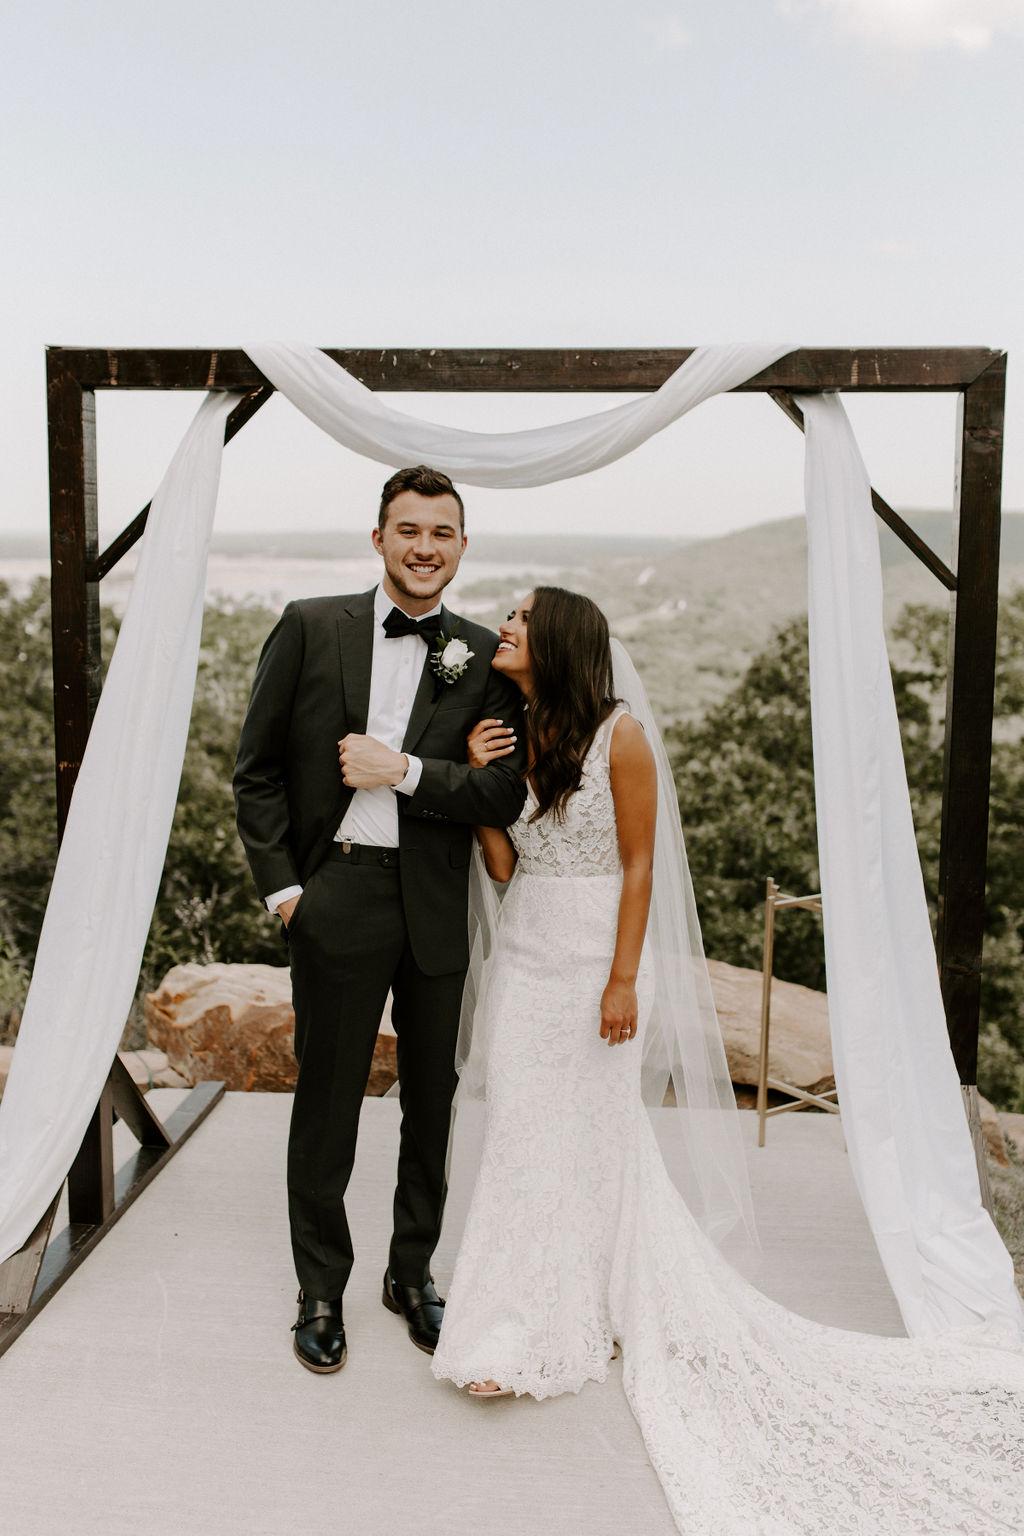 Tulsa White Barn Wedding Venue Outdoor Ceremony 46.jpg